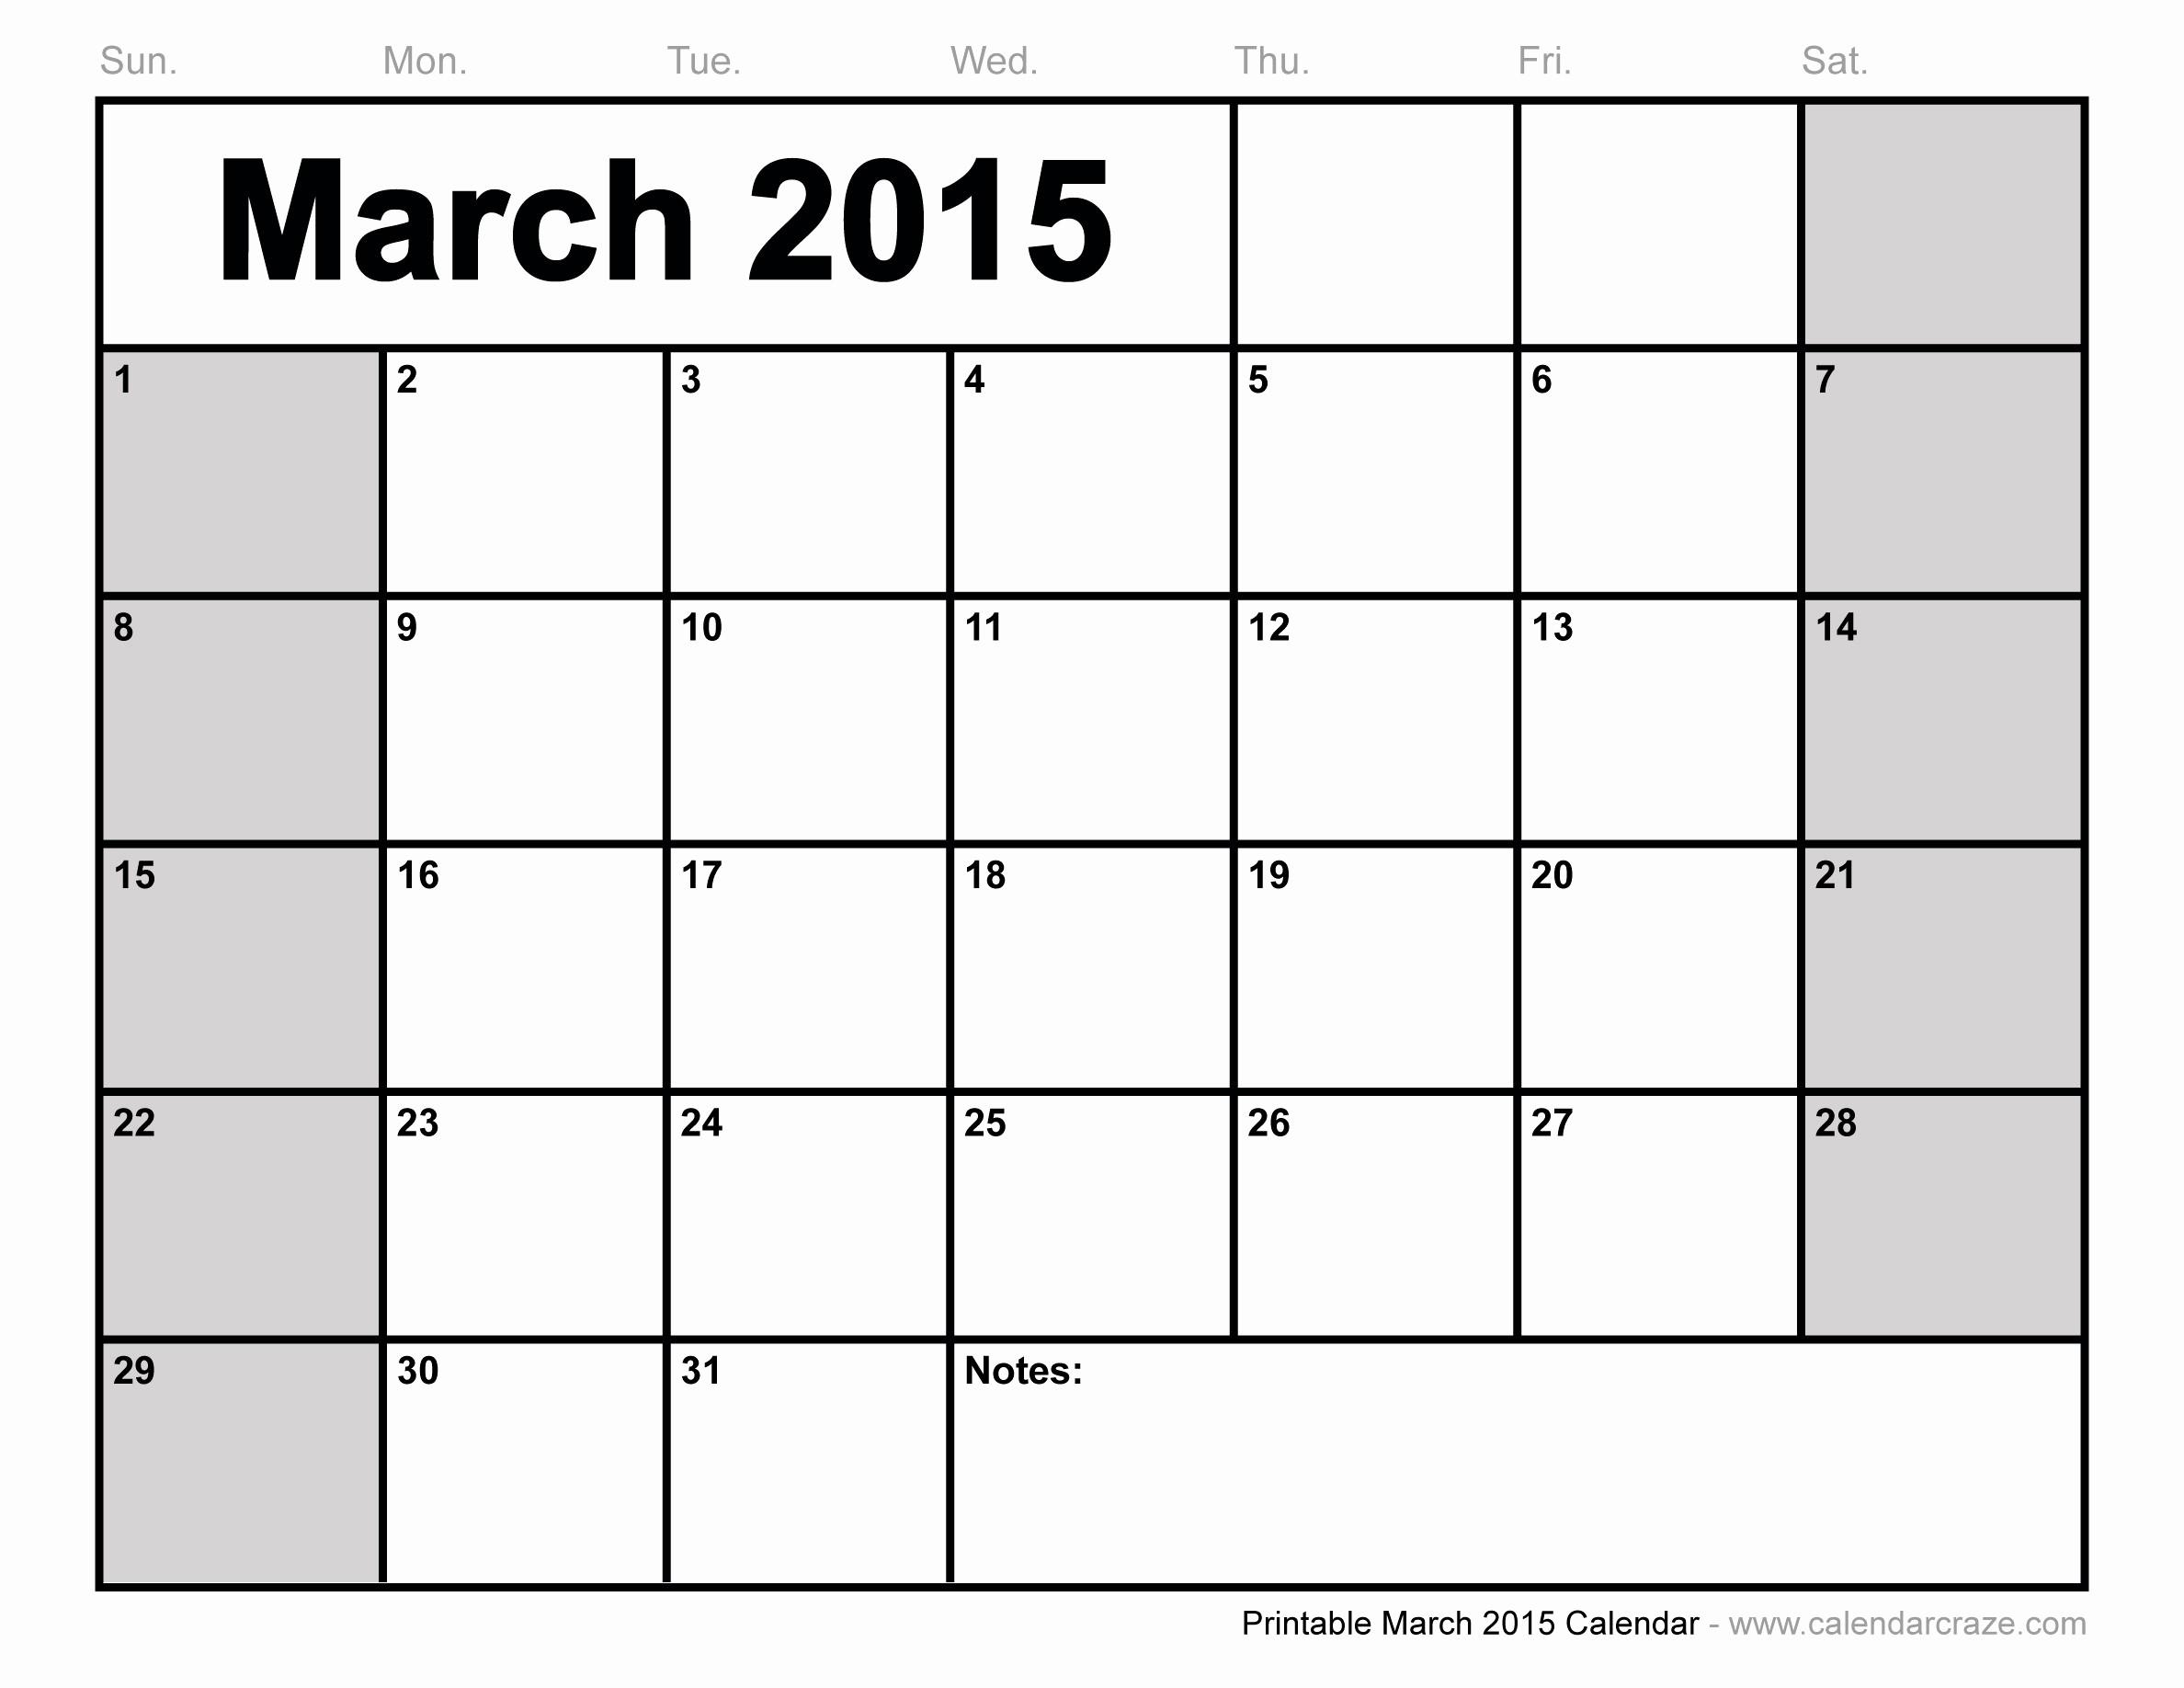 2017 Calendar Month by Month Elegant 2015 Calendar Printable by Month – 2017 Printable Calendar